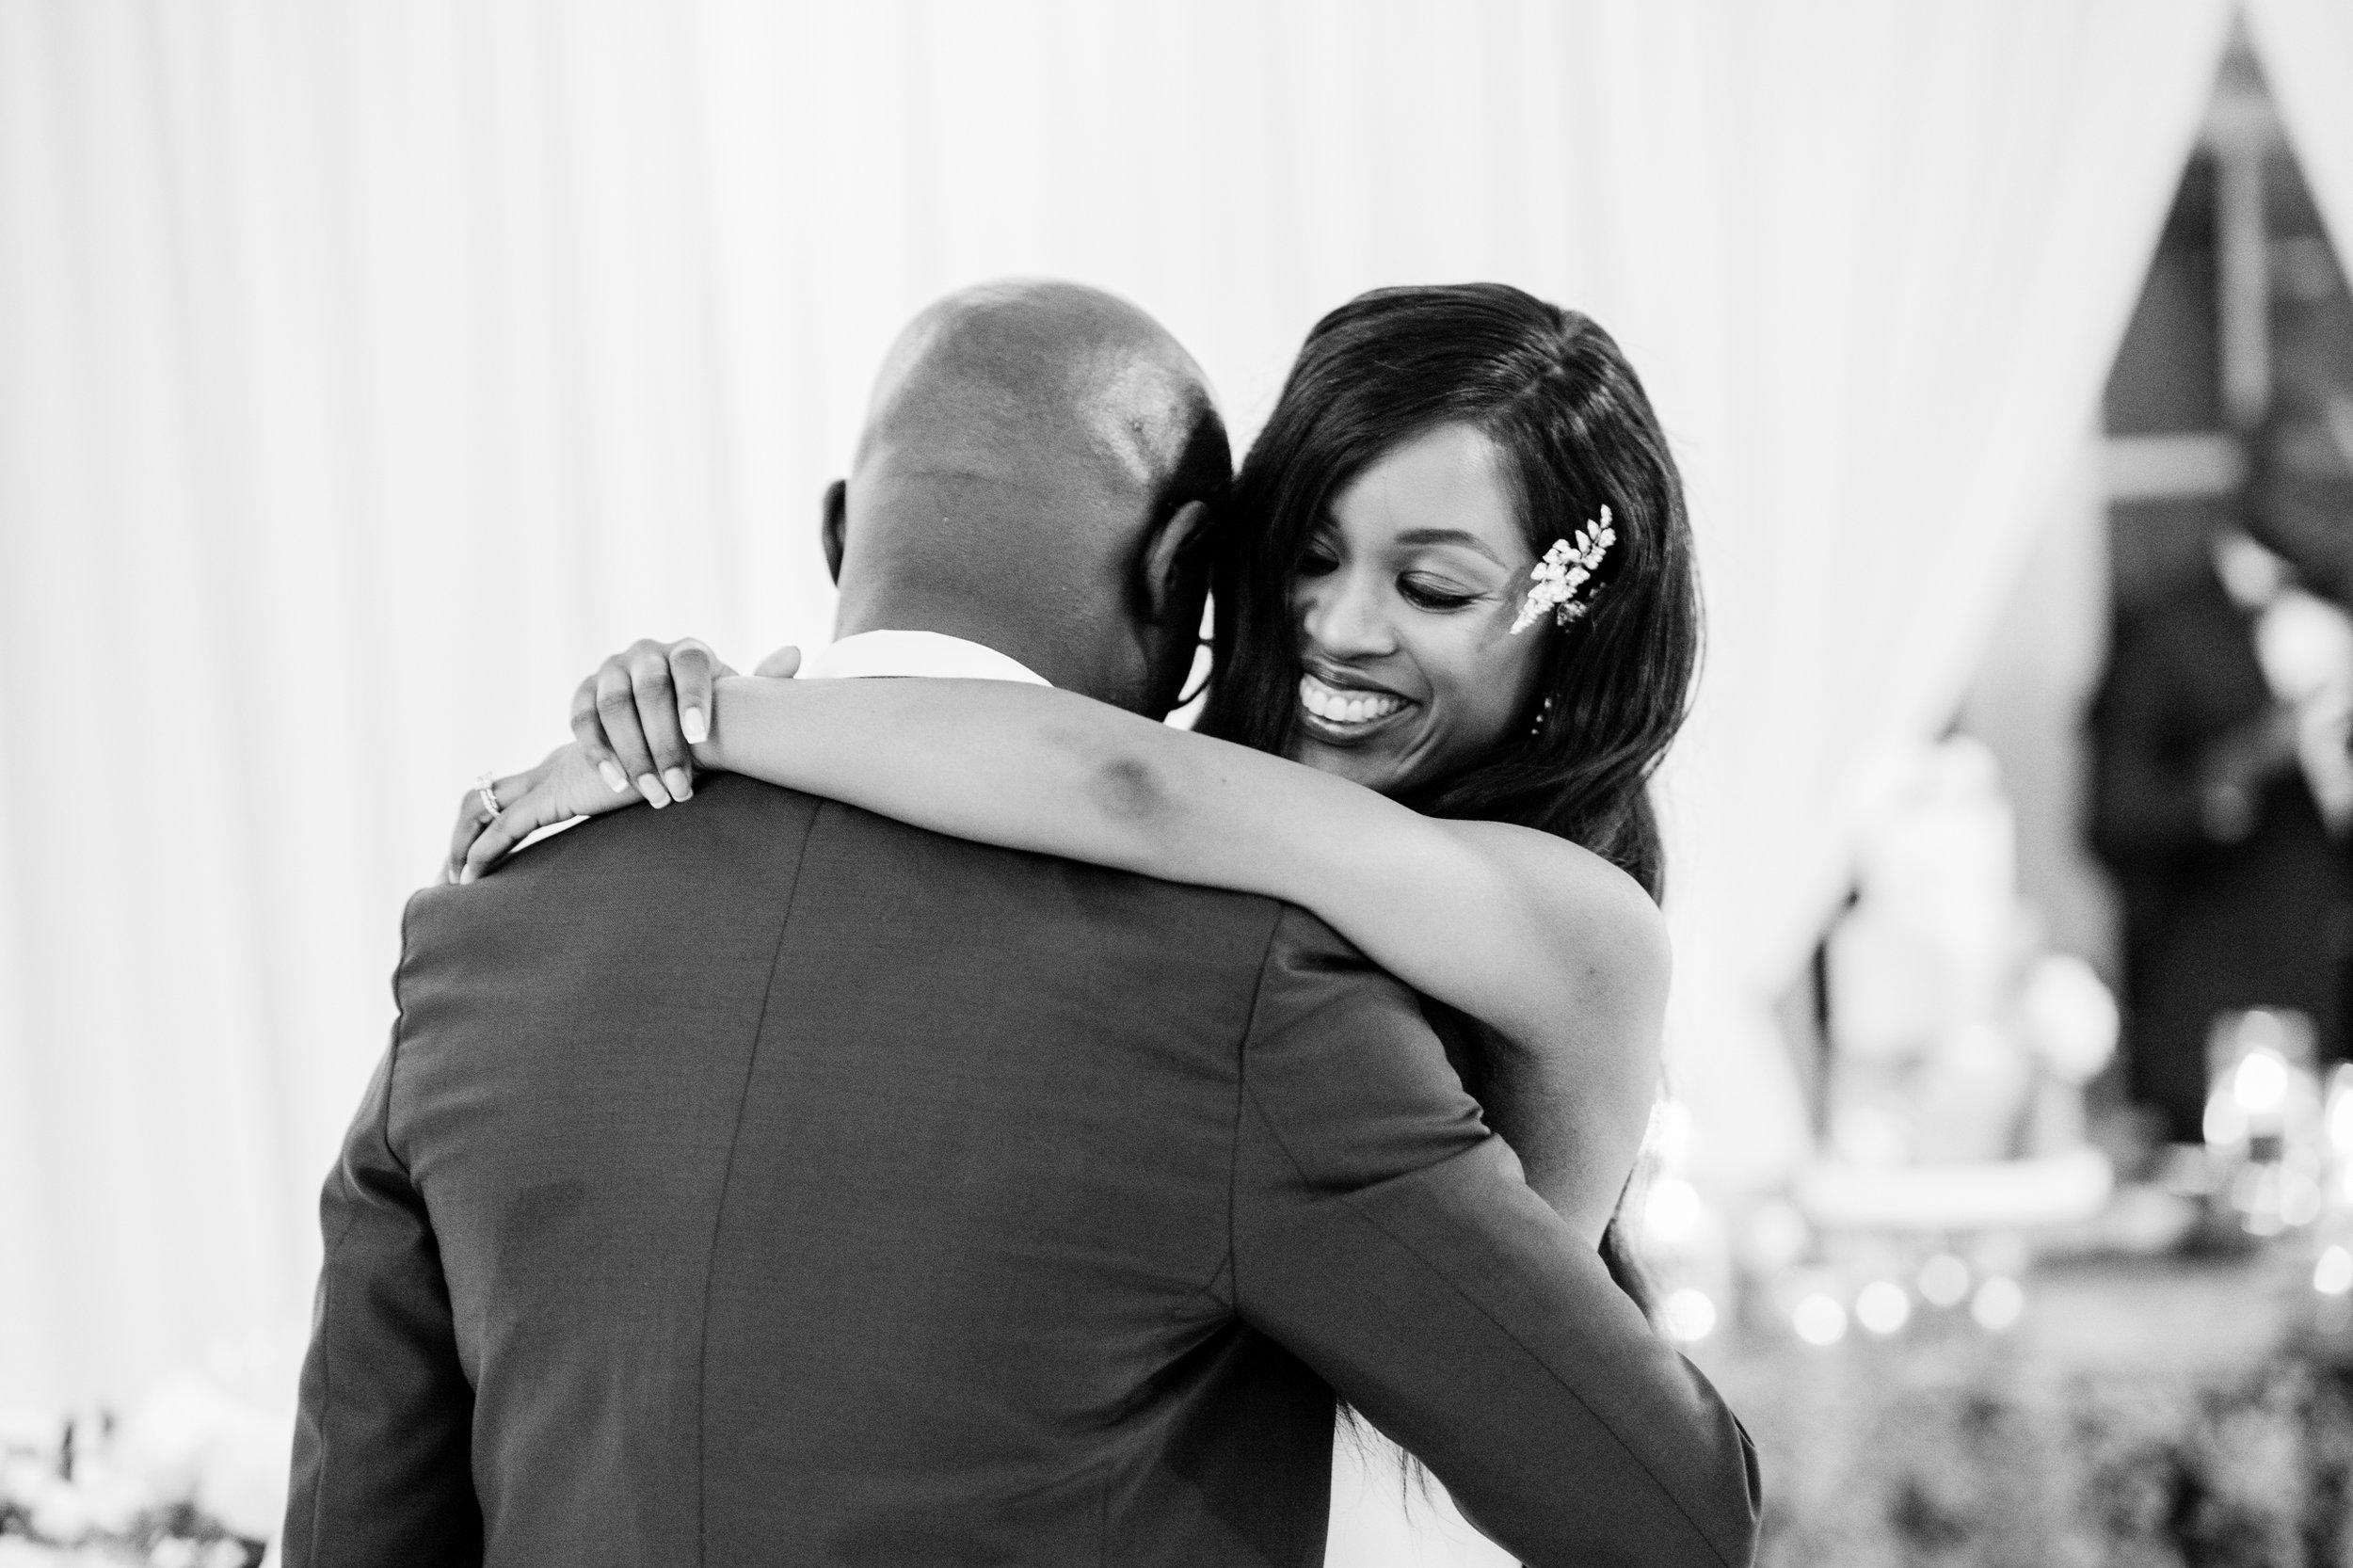 ritz-carlton-laguna-niguel-wedding-sonya_0205.JPG